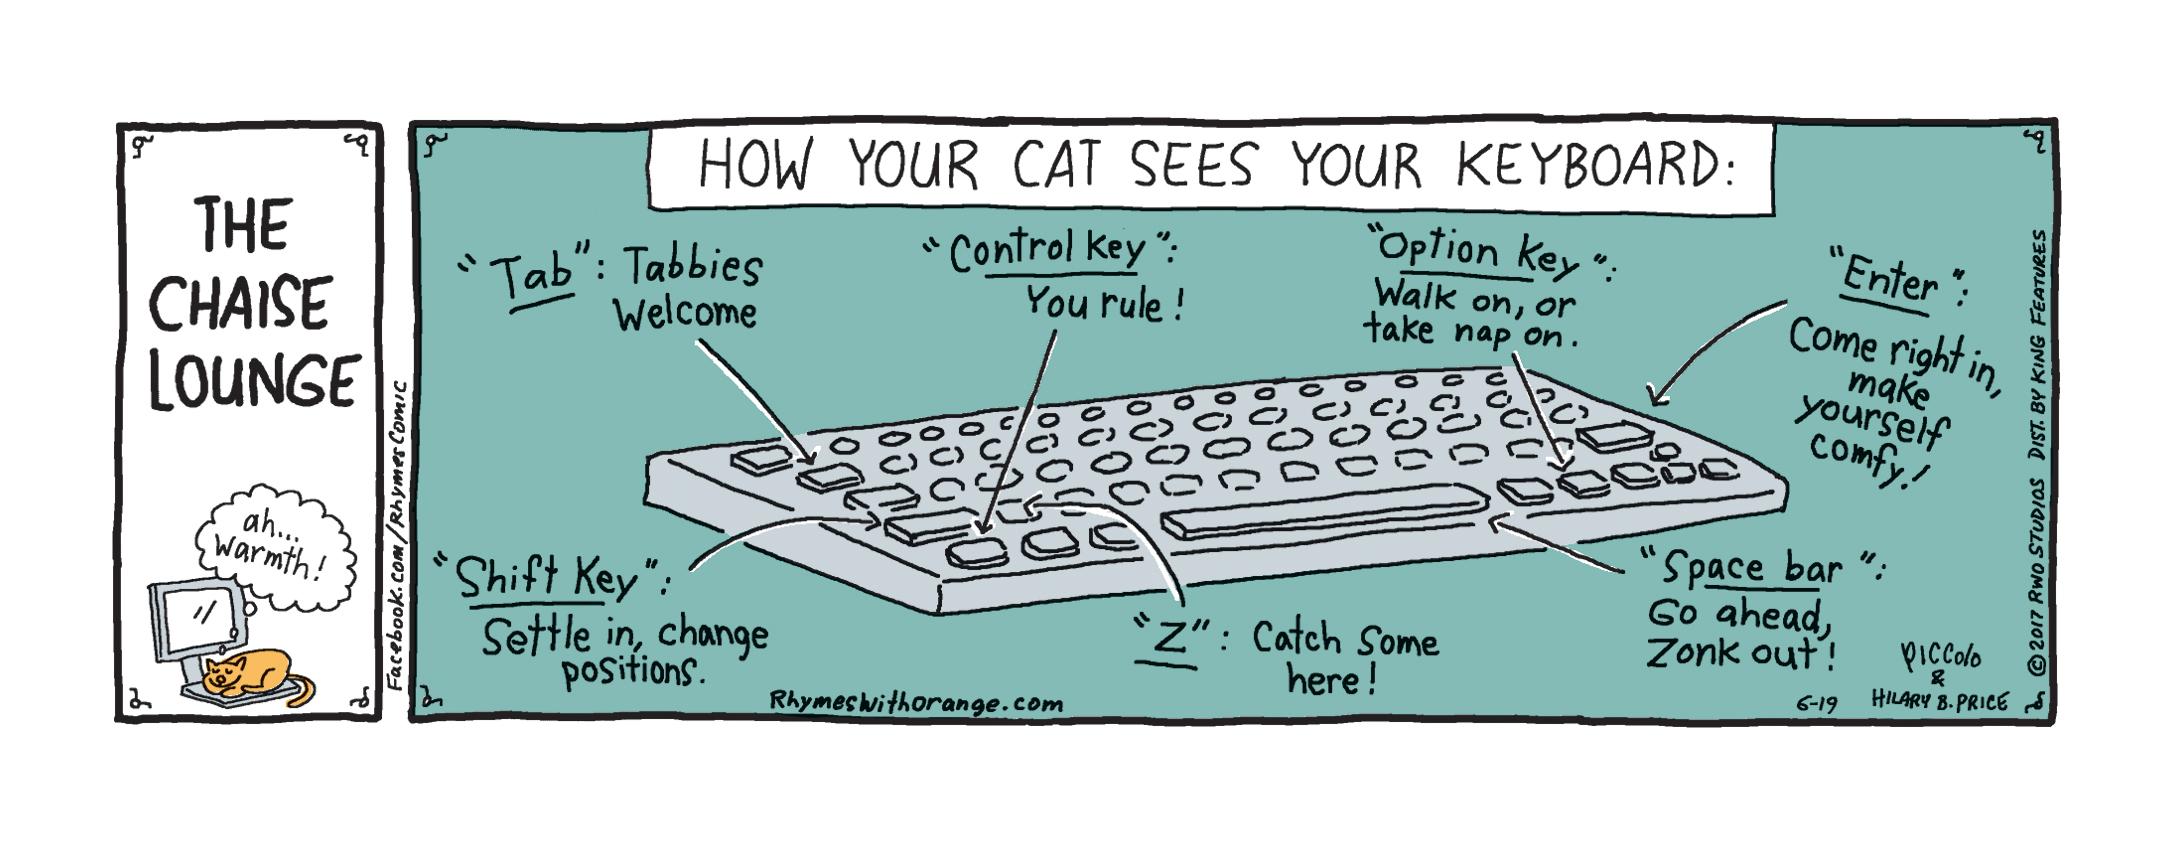 How Cat sees Keyboard.jpg